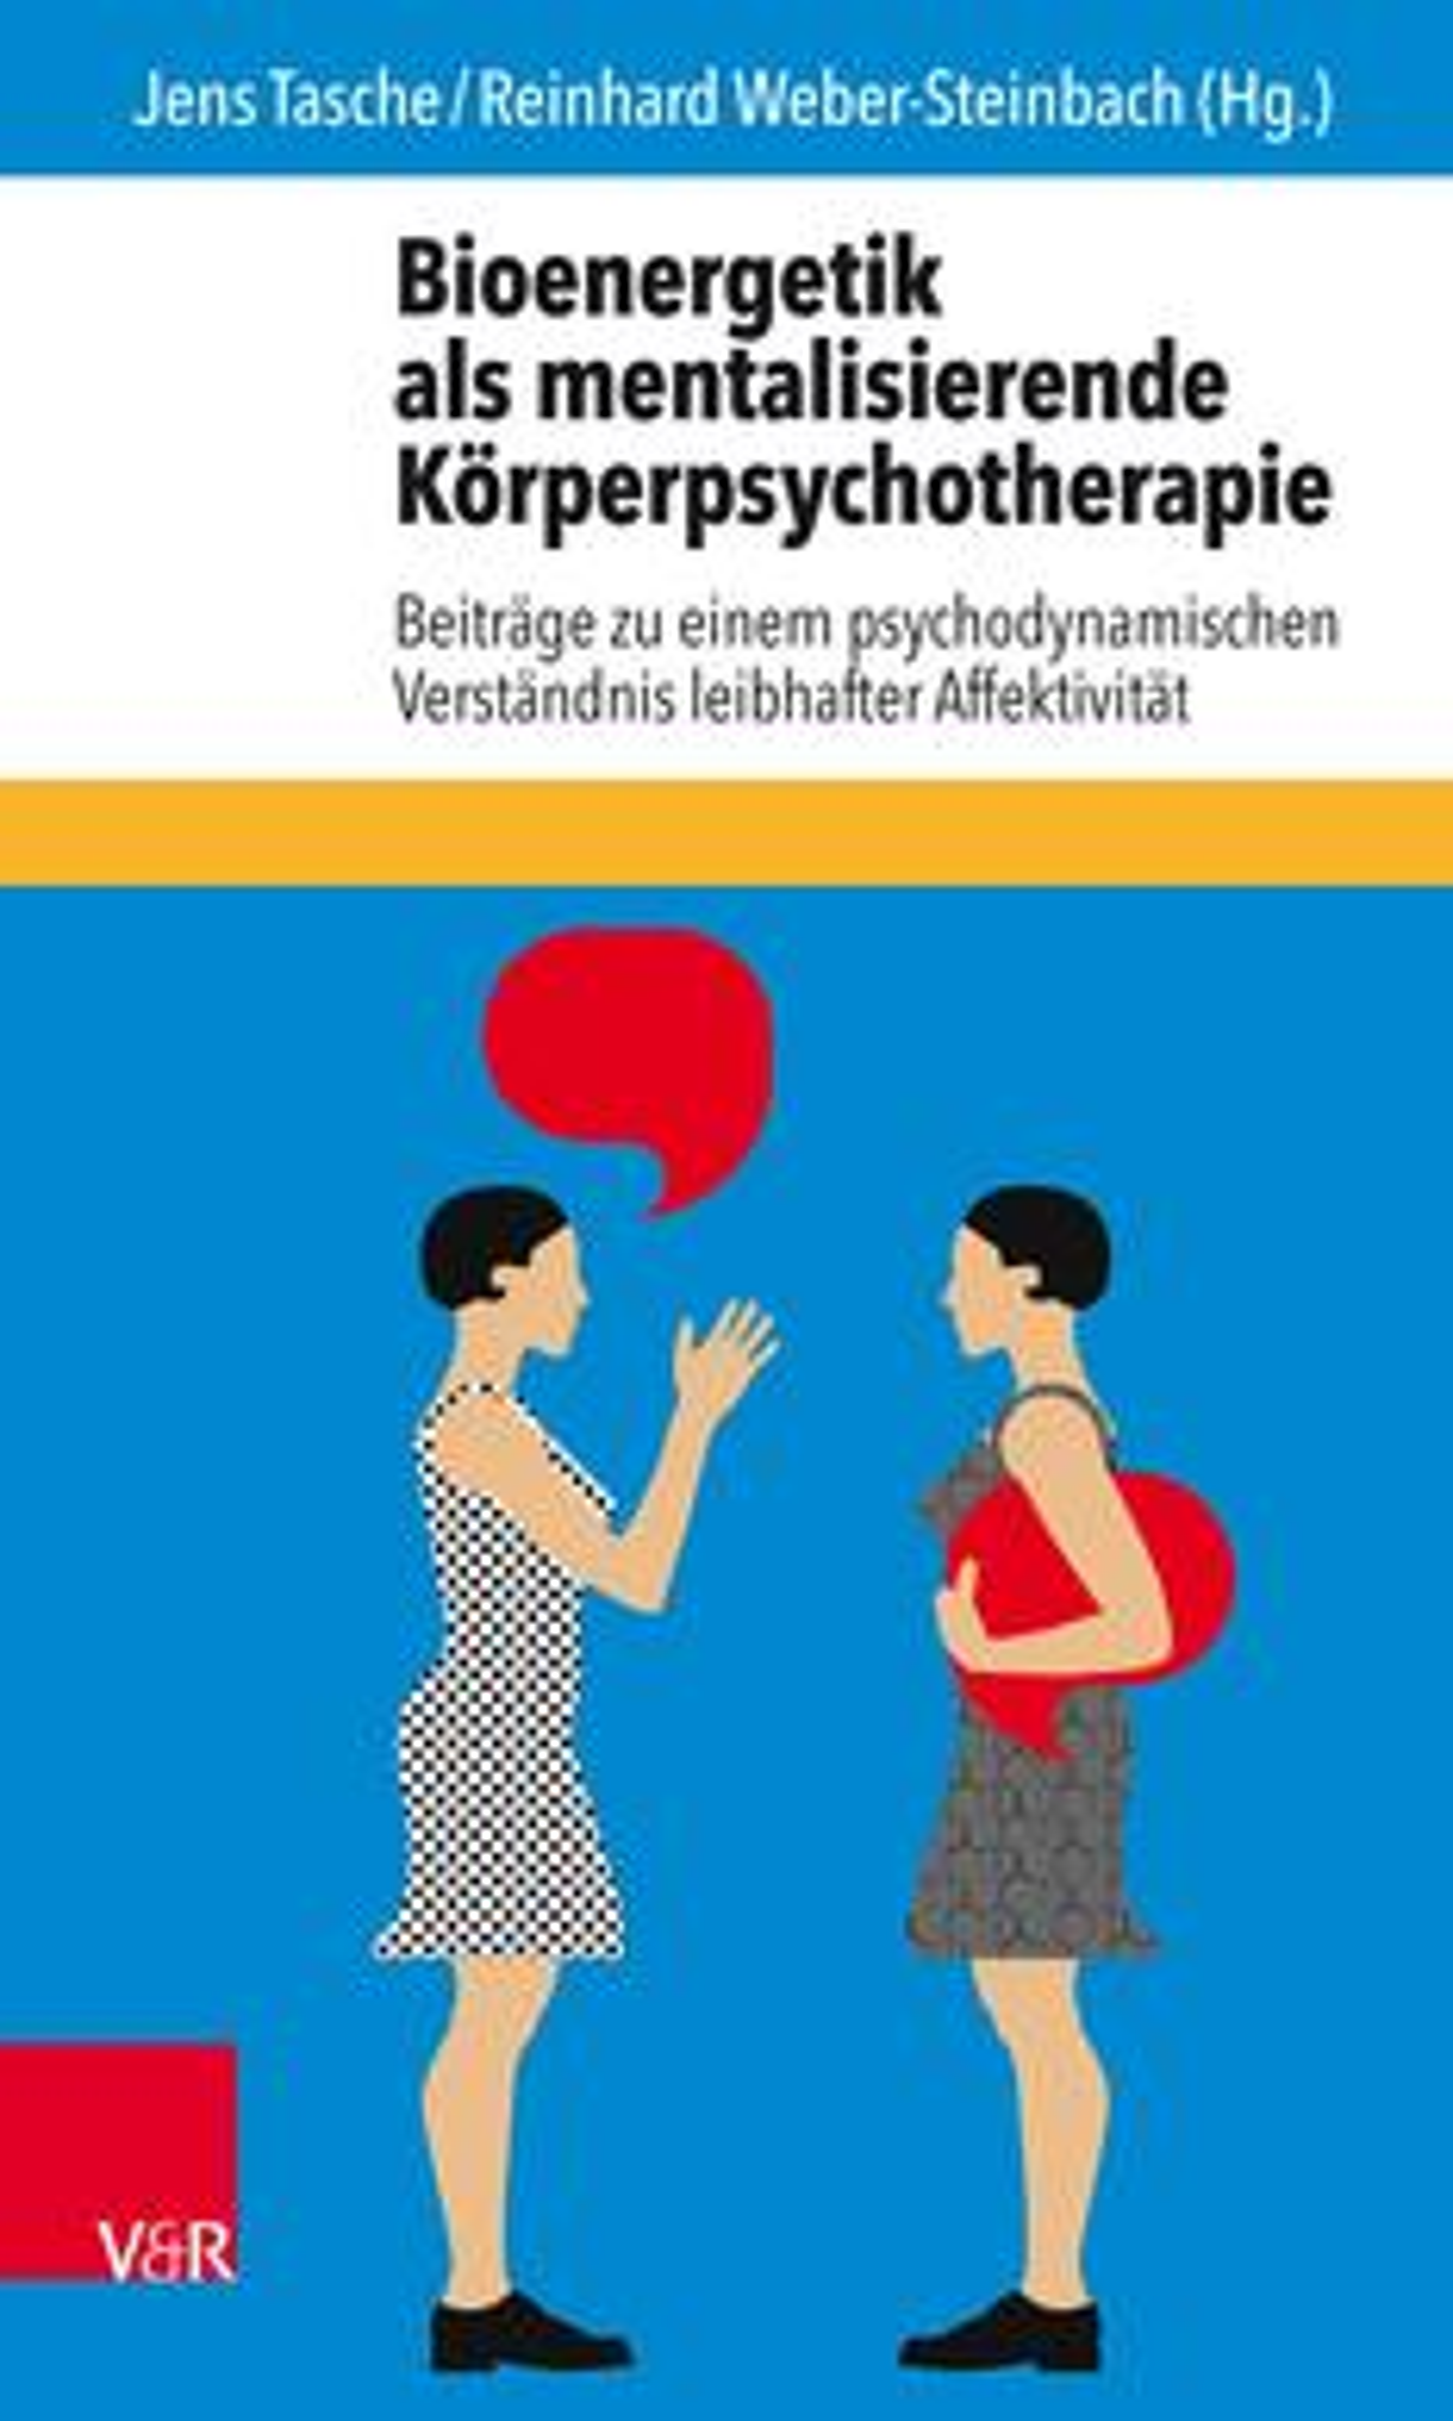 Bioenergetik als mentalisierende Körperpsychotherapie